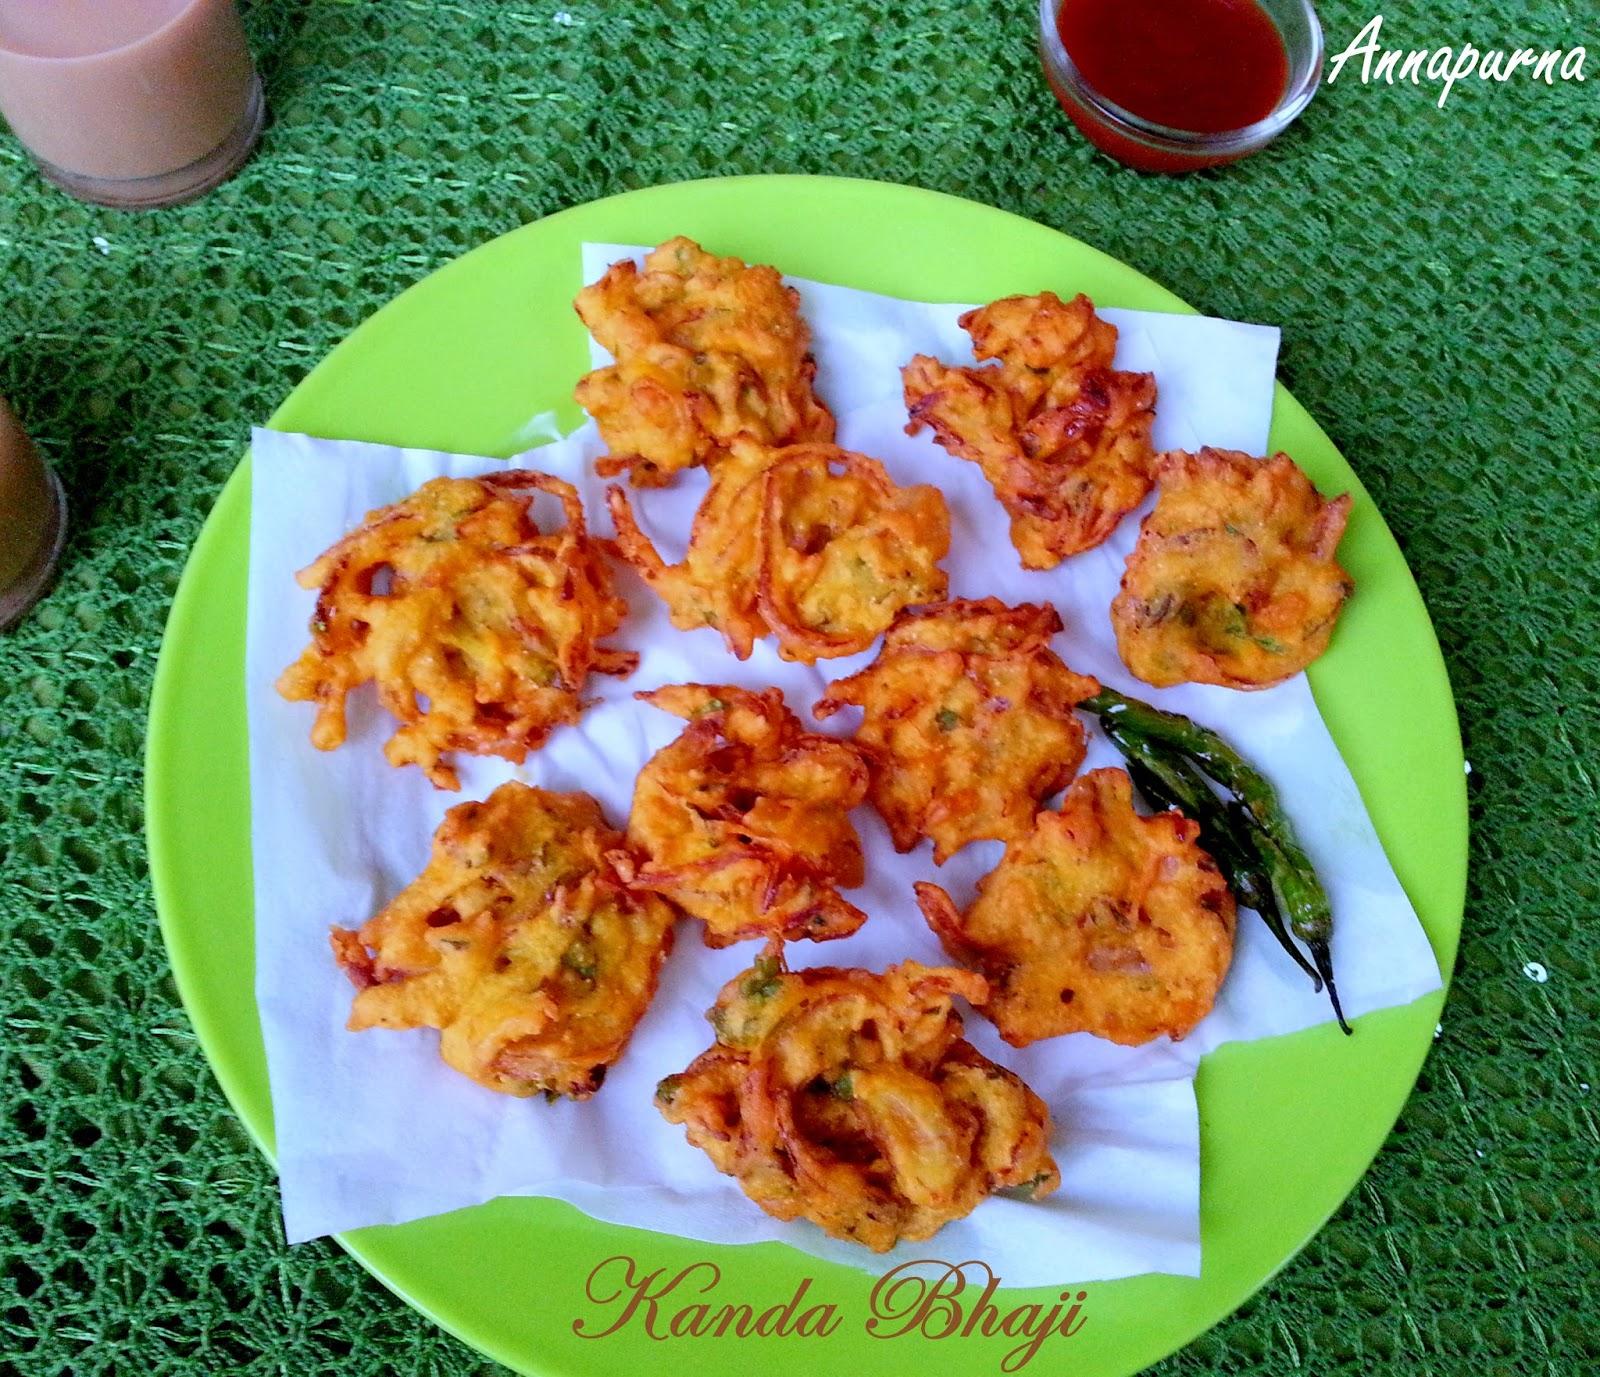 Annapurna kanda bhaji onion fritters indian street food recipe kanda bhaji onion fritters indian street food recipe forumfinder Gallery